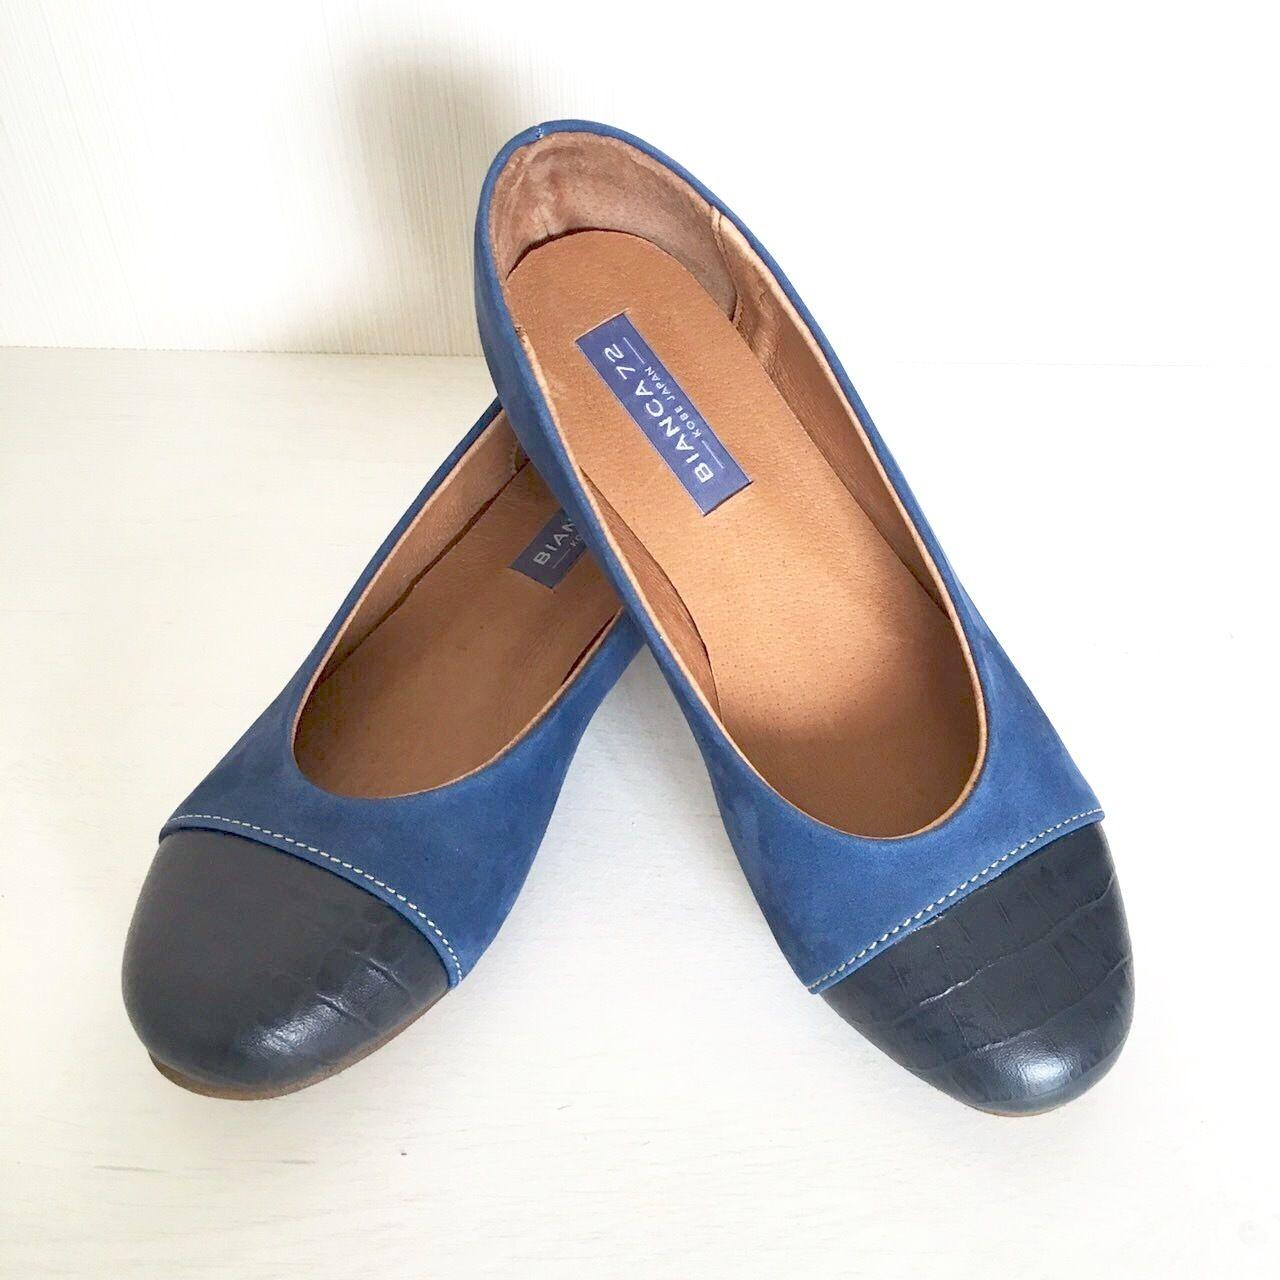 Artisan Handmade Orginal Leather Ballet Flat【Navy】バイカラーレザーバレエフラット【ネイビー】【本革】【madeinKOBE】